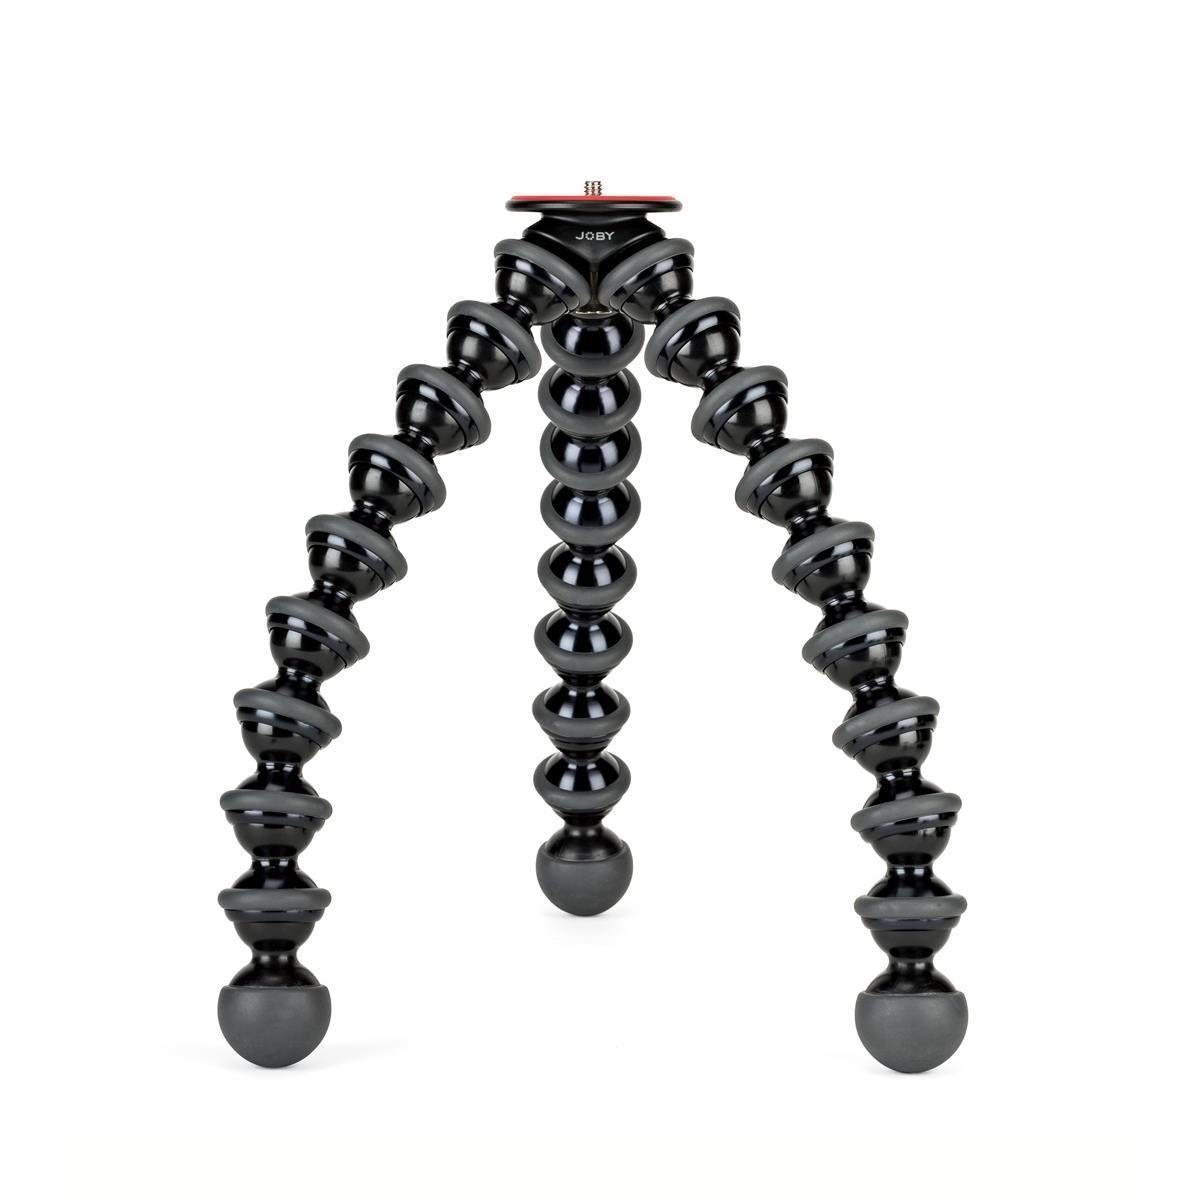 Joby GorillaPod 5K Stand Flexibel Statief